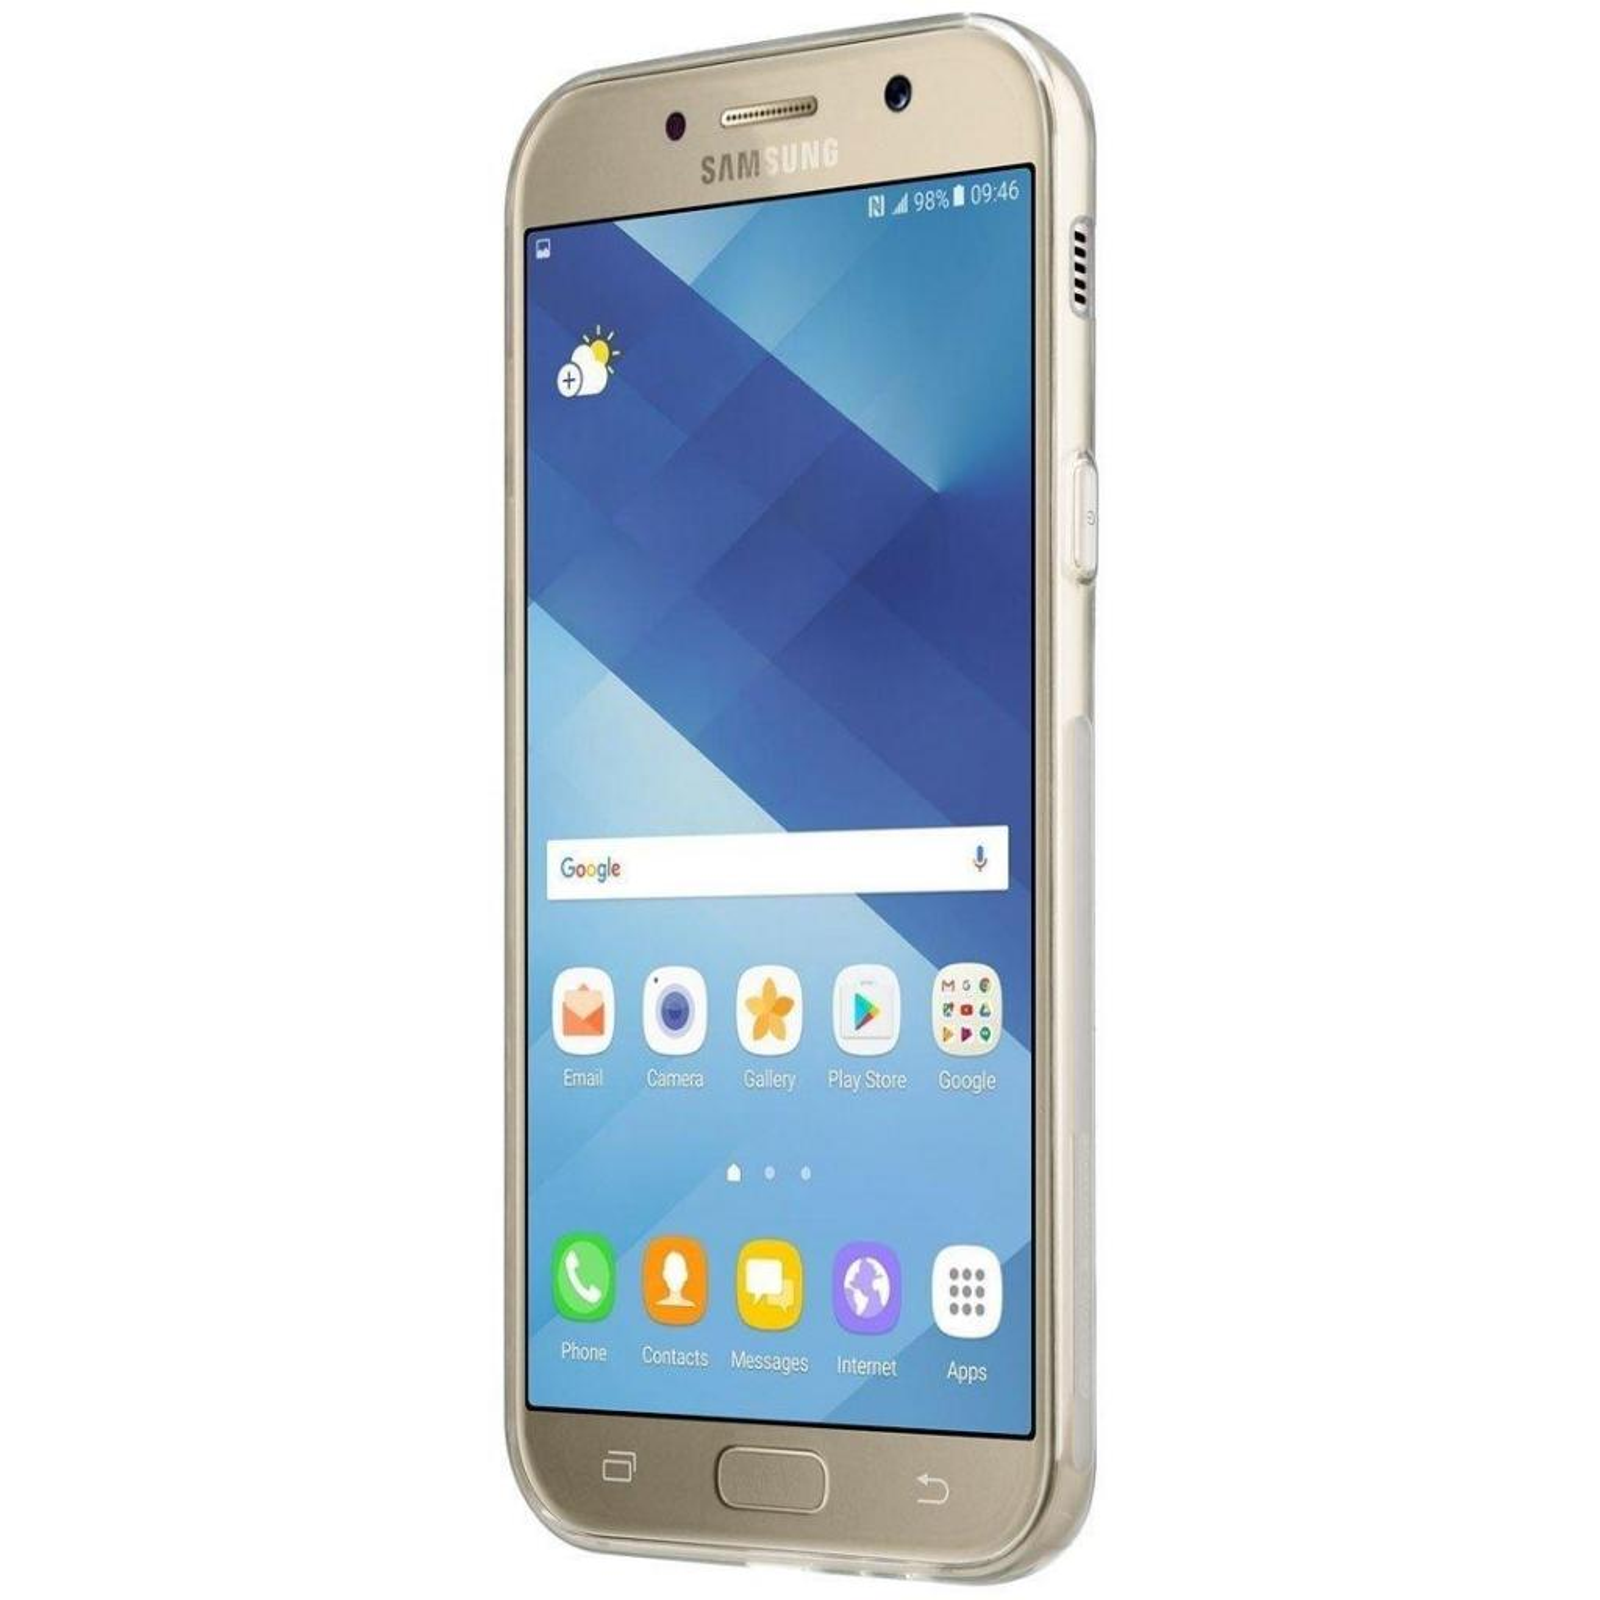 Чехол для моб. телефона SmartCase Samsung Galaxy A7 /A720 TPU Clear (SC-A7) изображение 2